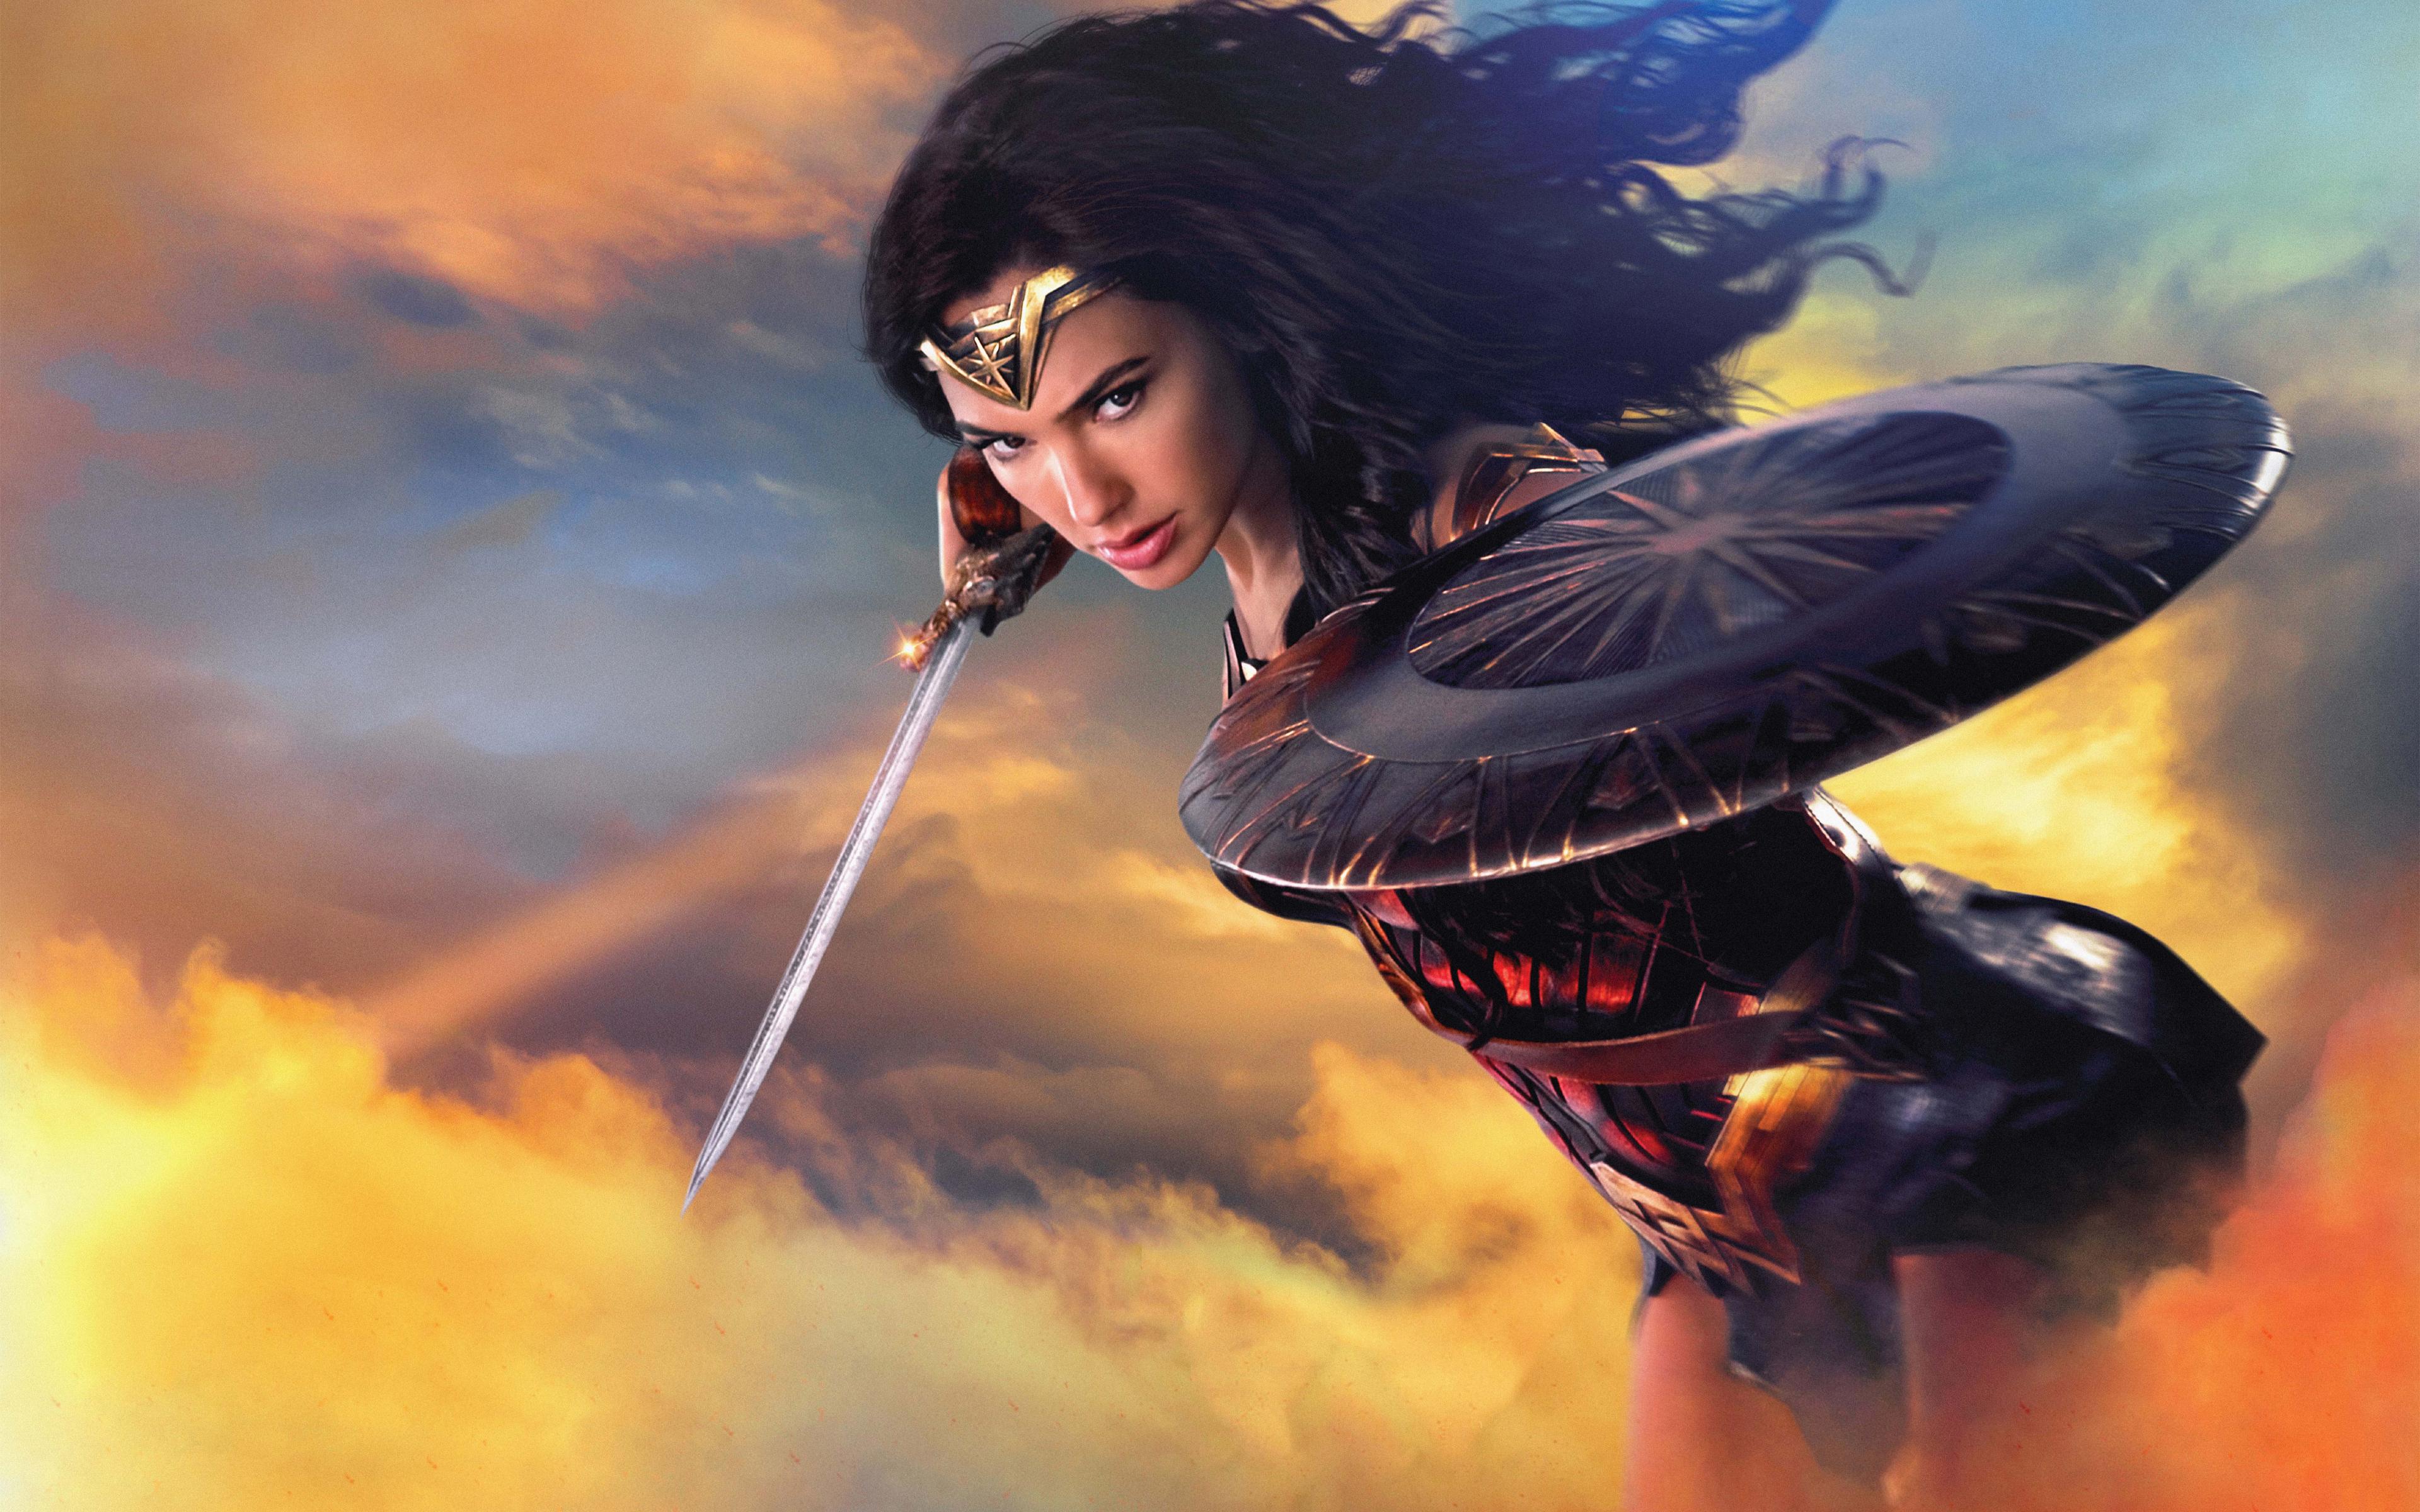 Wallpaper Gal Gadot Wonder Woman 2017 Movies Hd Movies: Download 3840x2400 Wallpaper 2017 Movie, Poster, Wonder